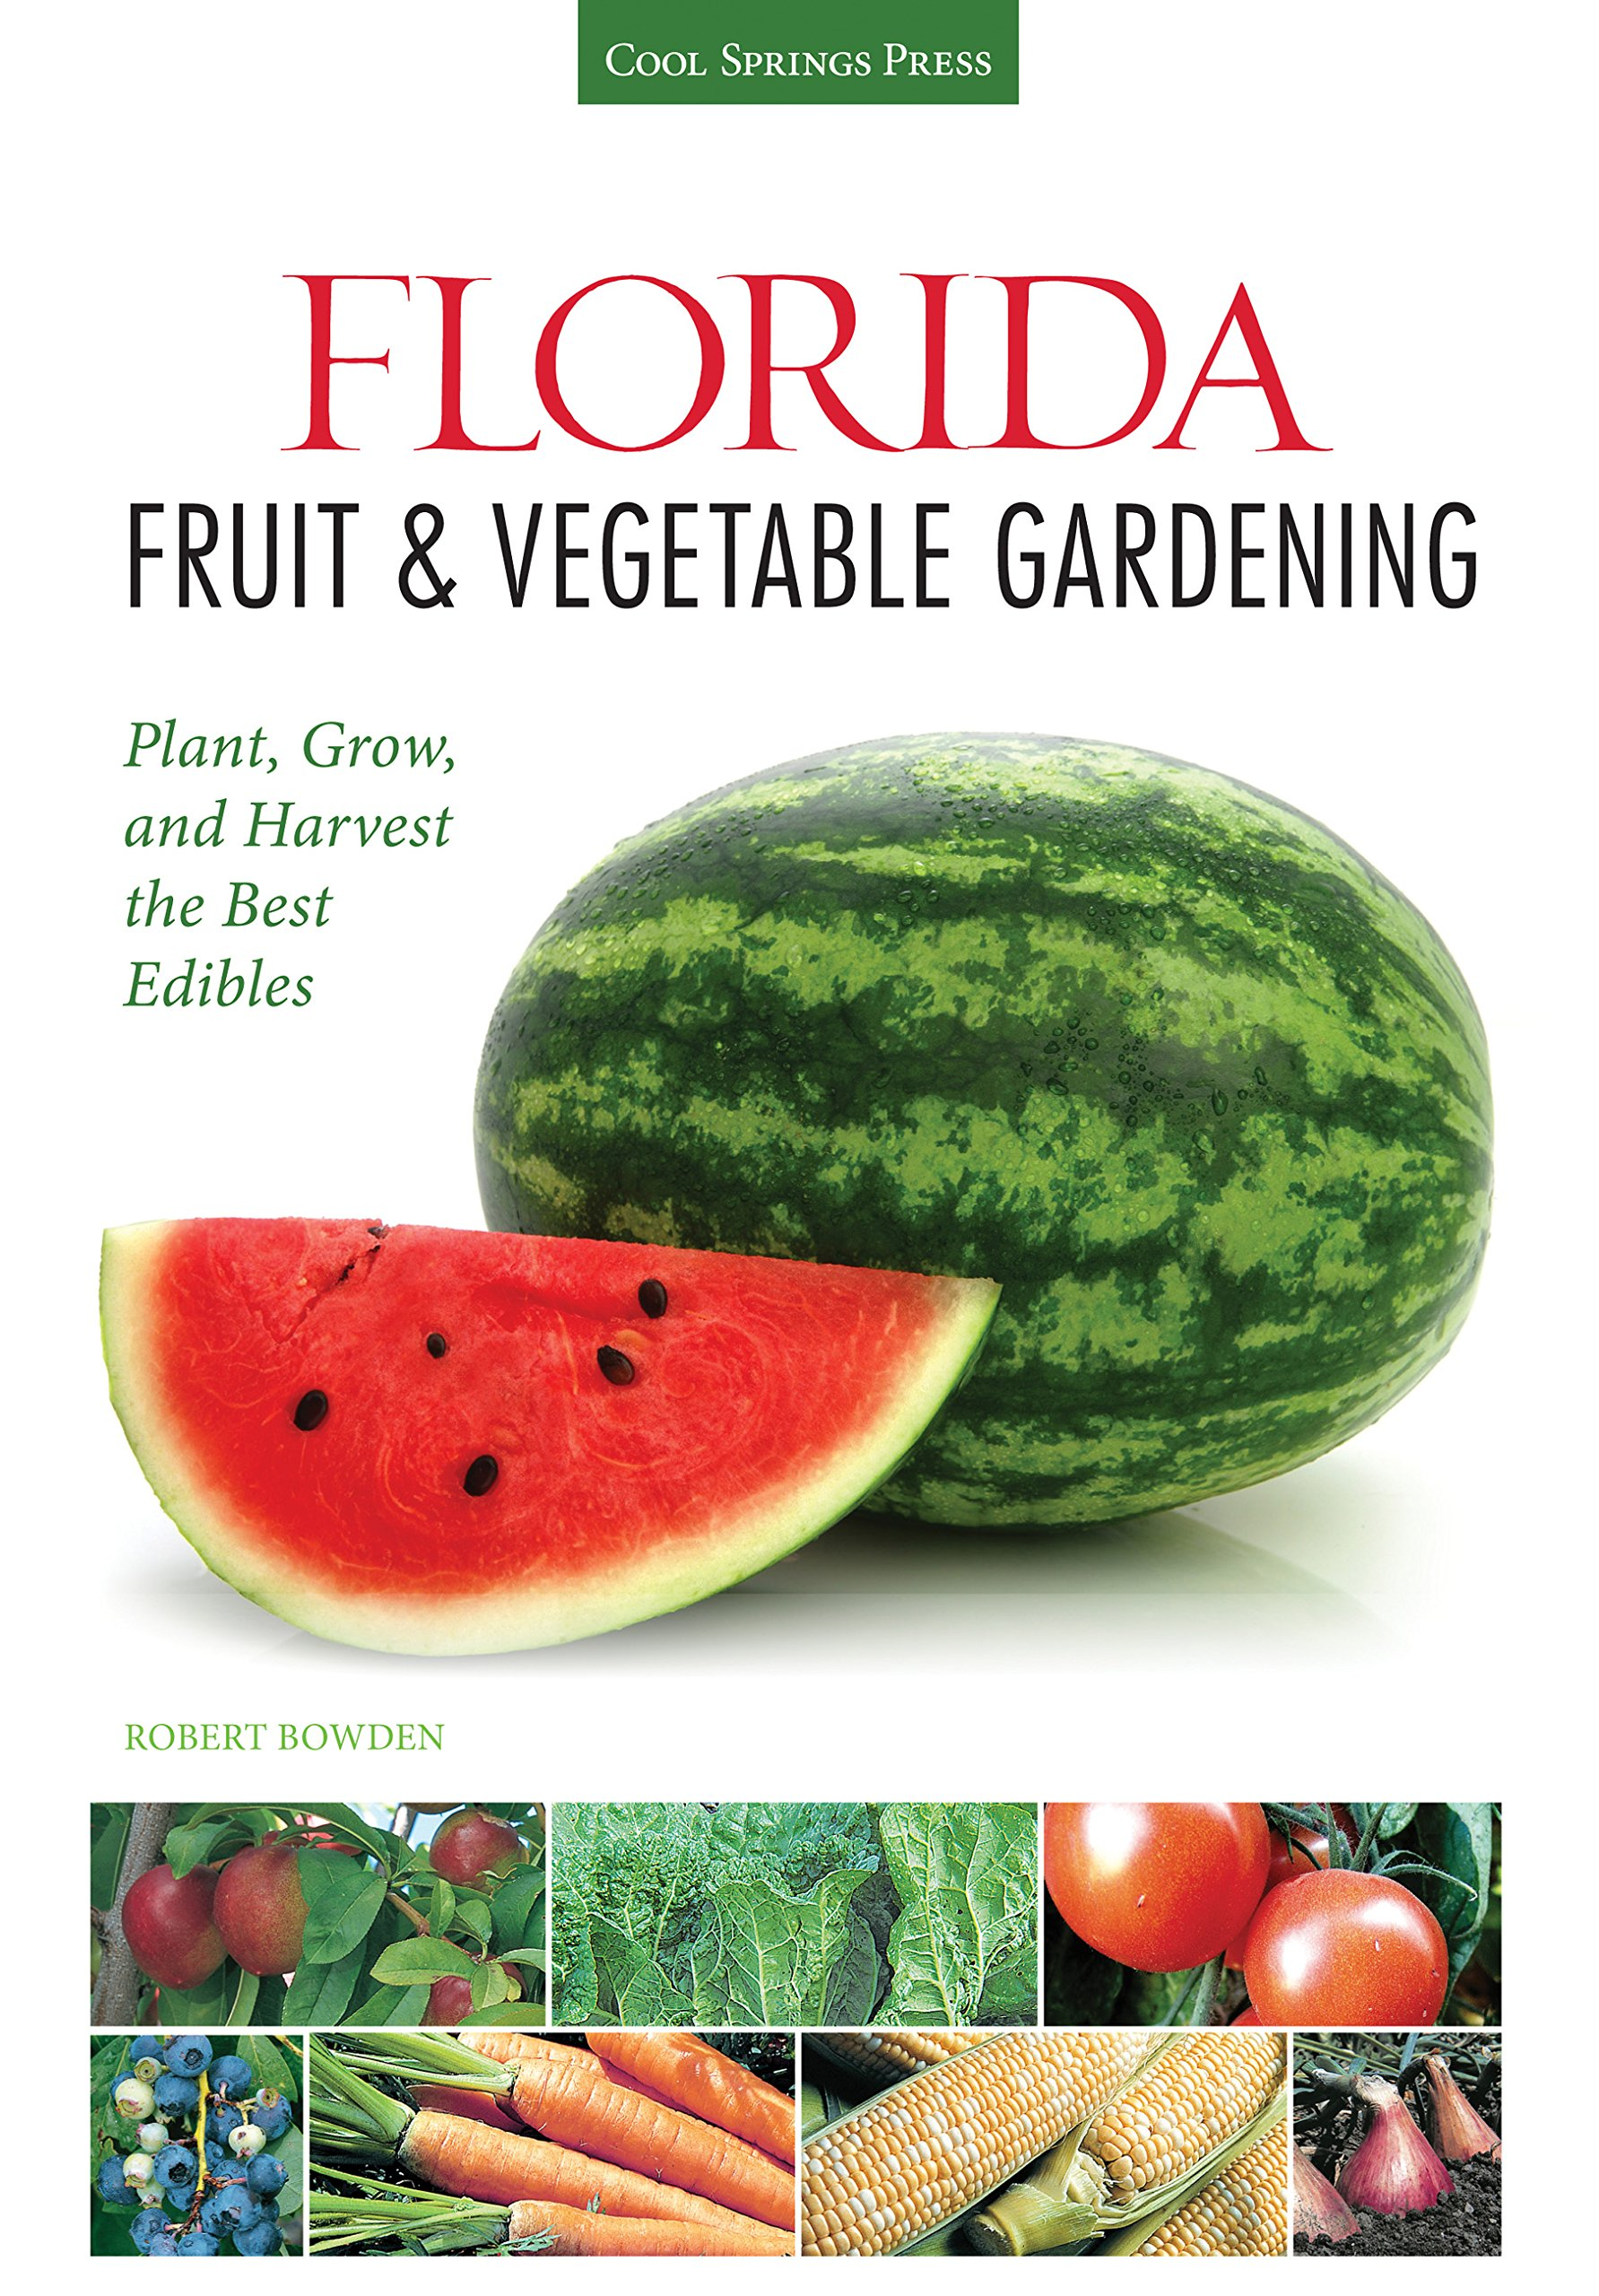 Florida Fruit & Vegetable Gardening: Plant, Grow, and Harvest the Best Edibles (Fruit & Vegetable Gardening Guides)